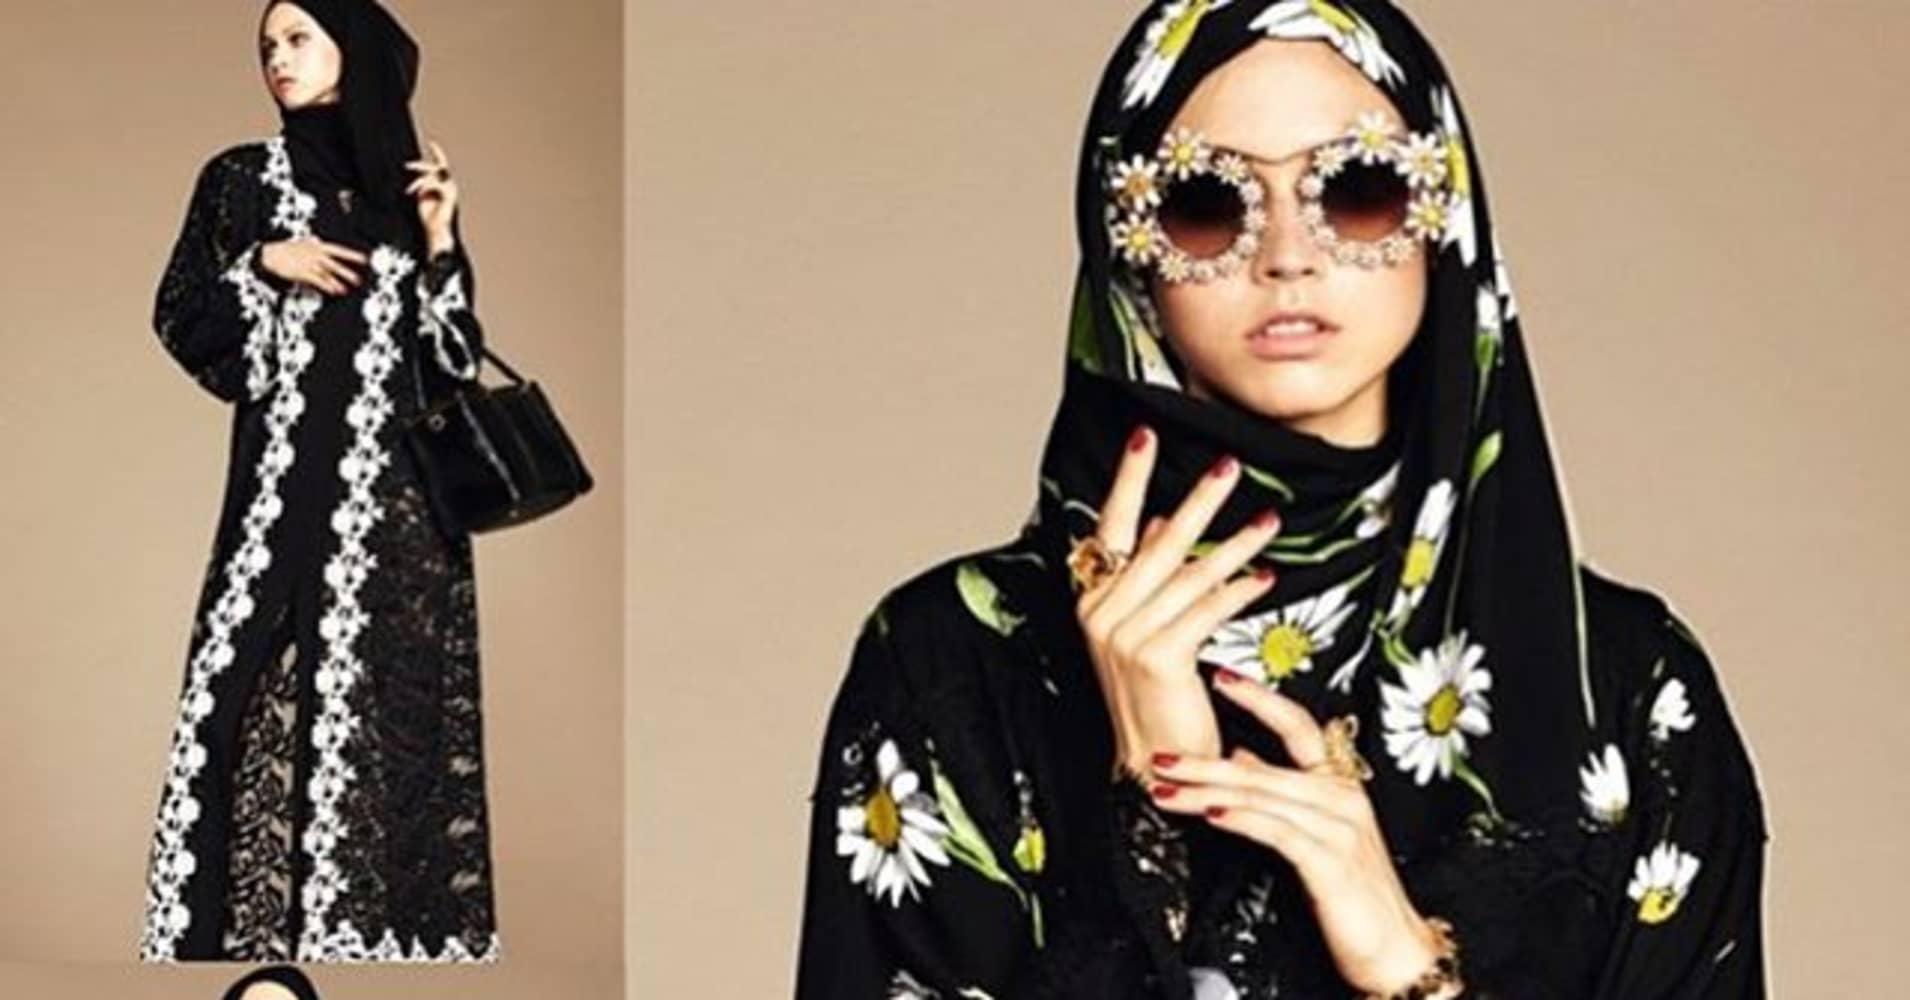 c01c39352 Dolce & Gabbana launch range of hijabs and abayas